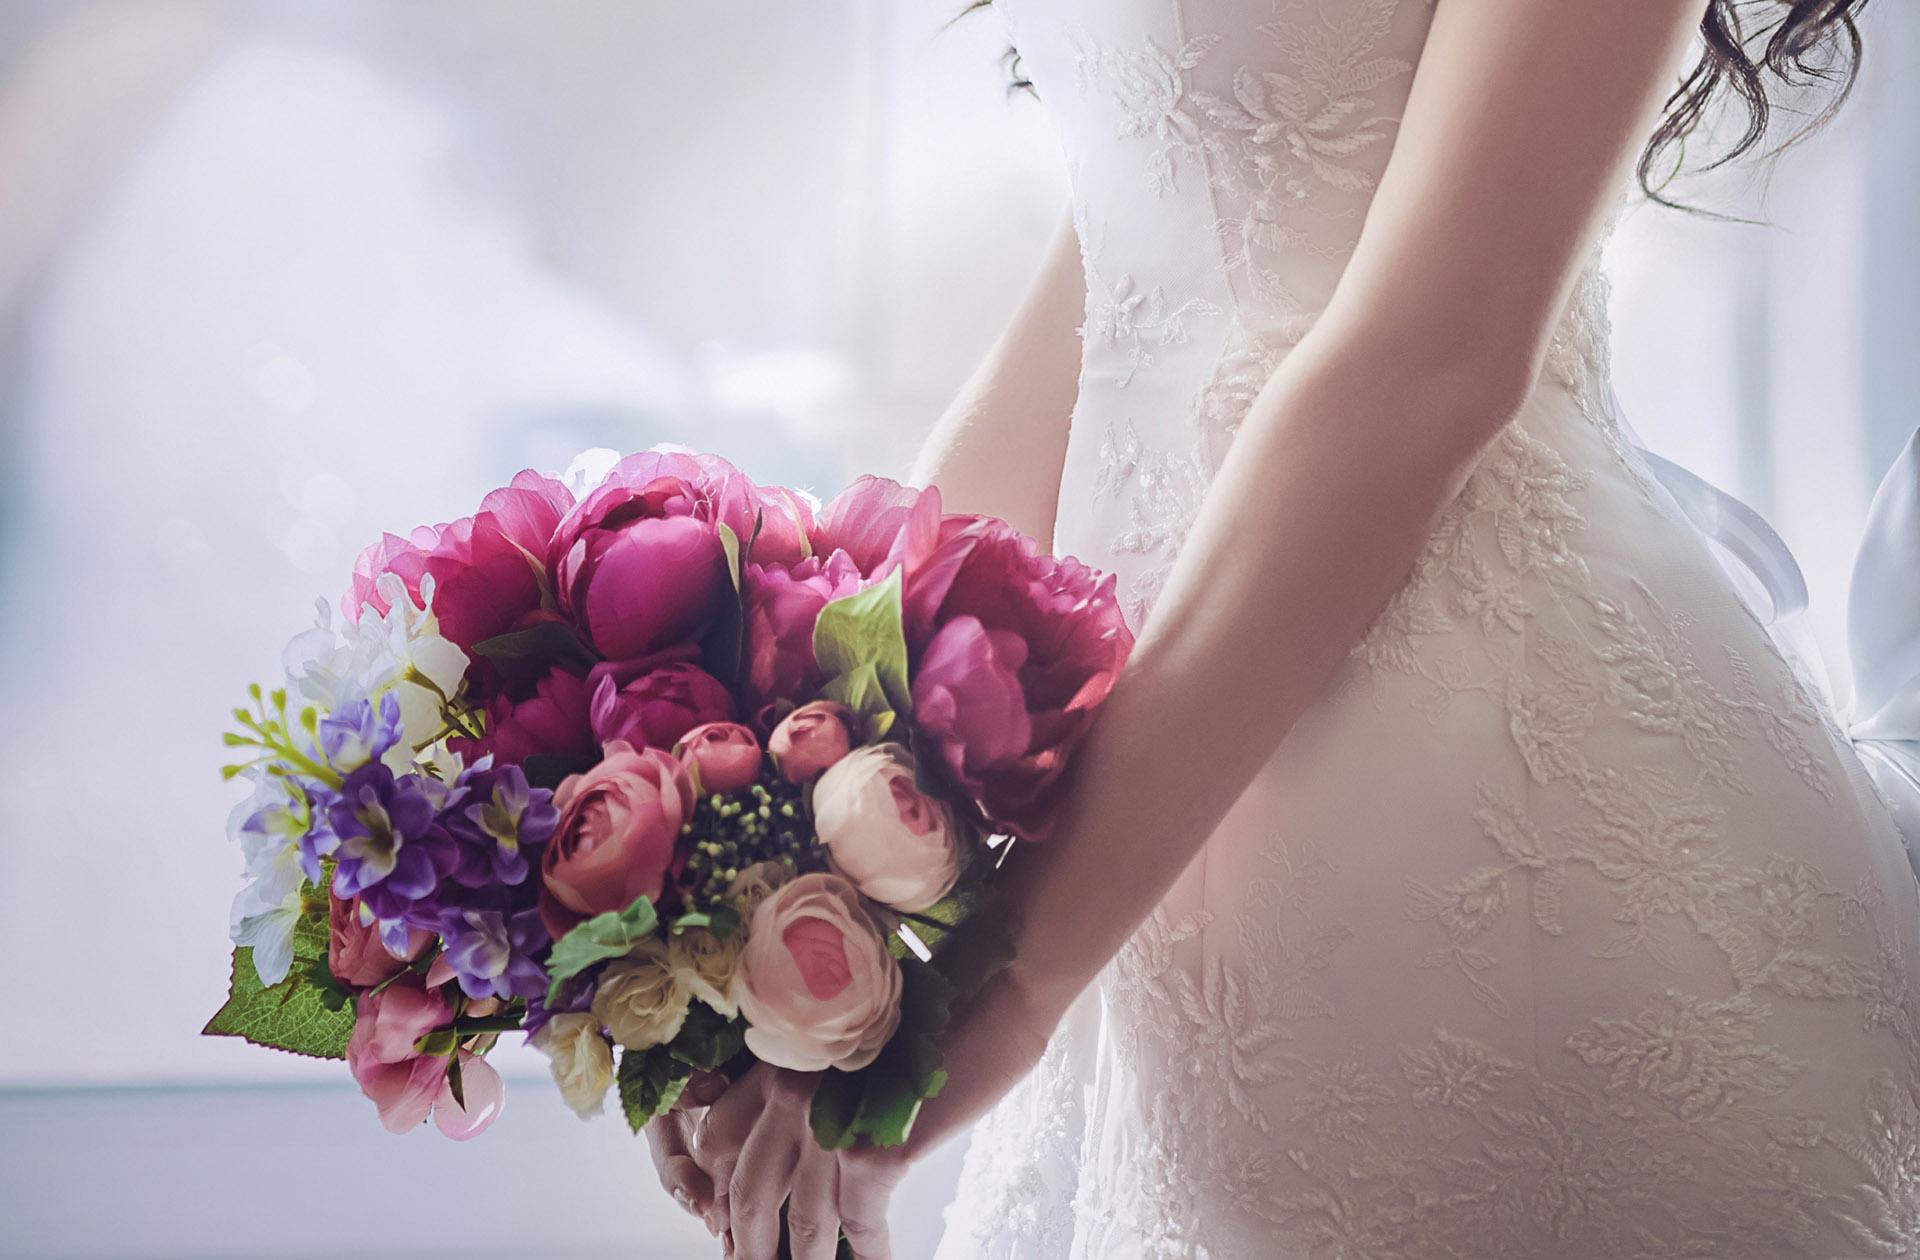 Balboa florist same day flowers delivery flower shop san diego izmirmasajfo